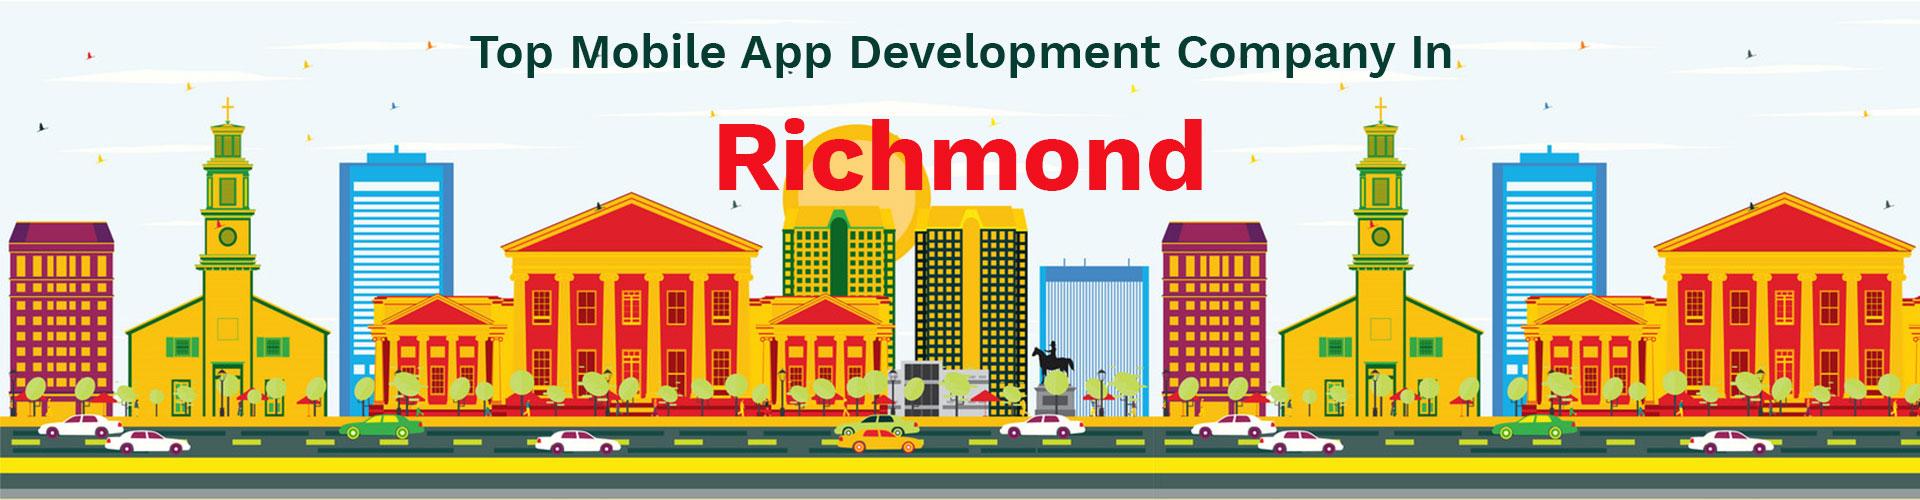 mobile app development company richmond